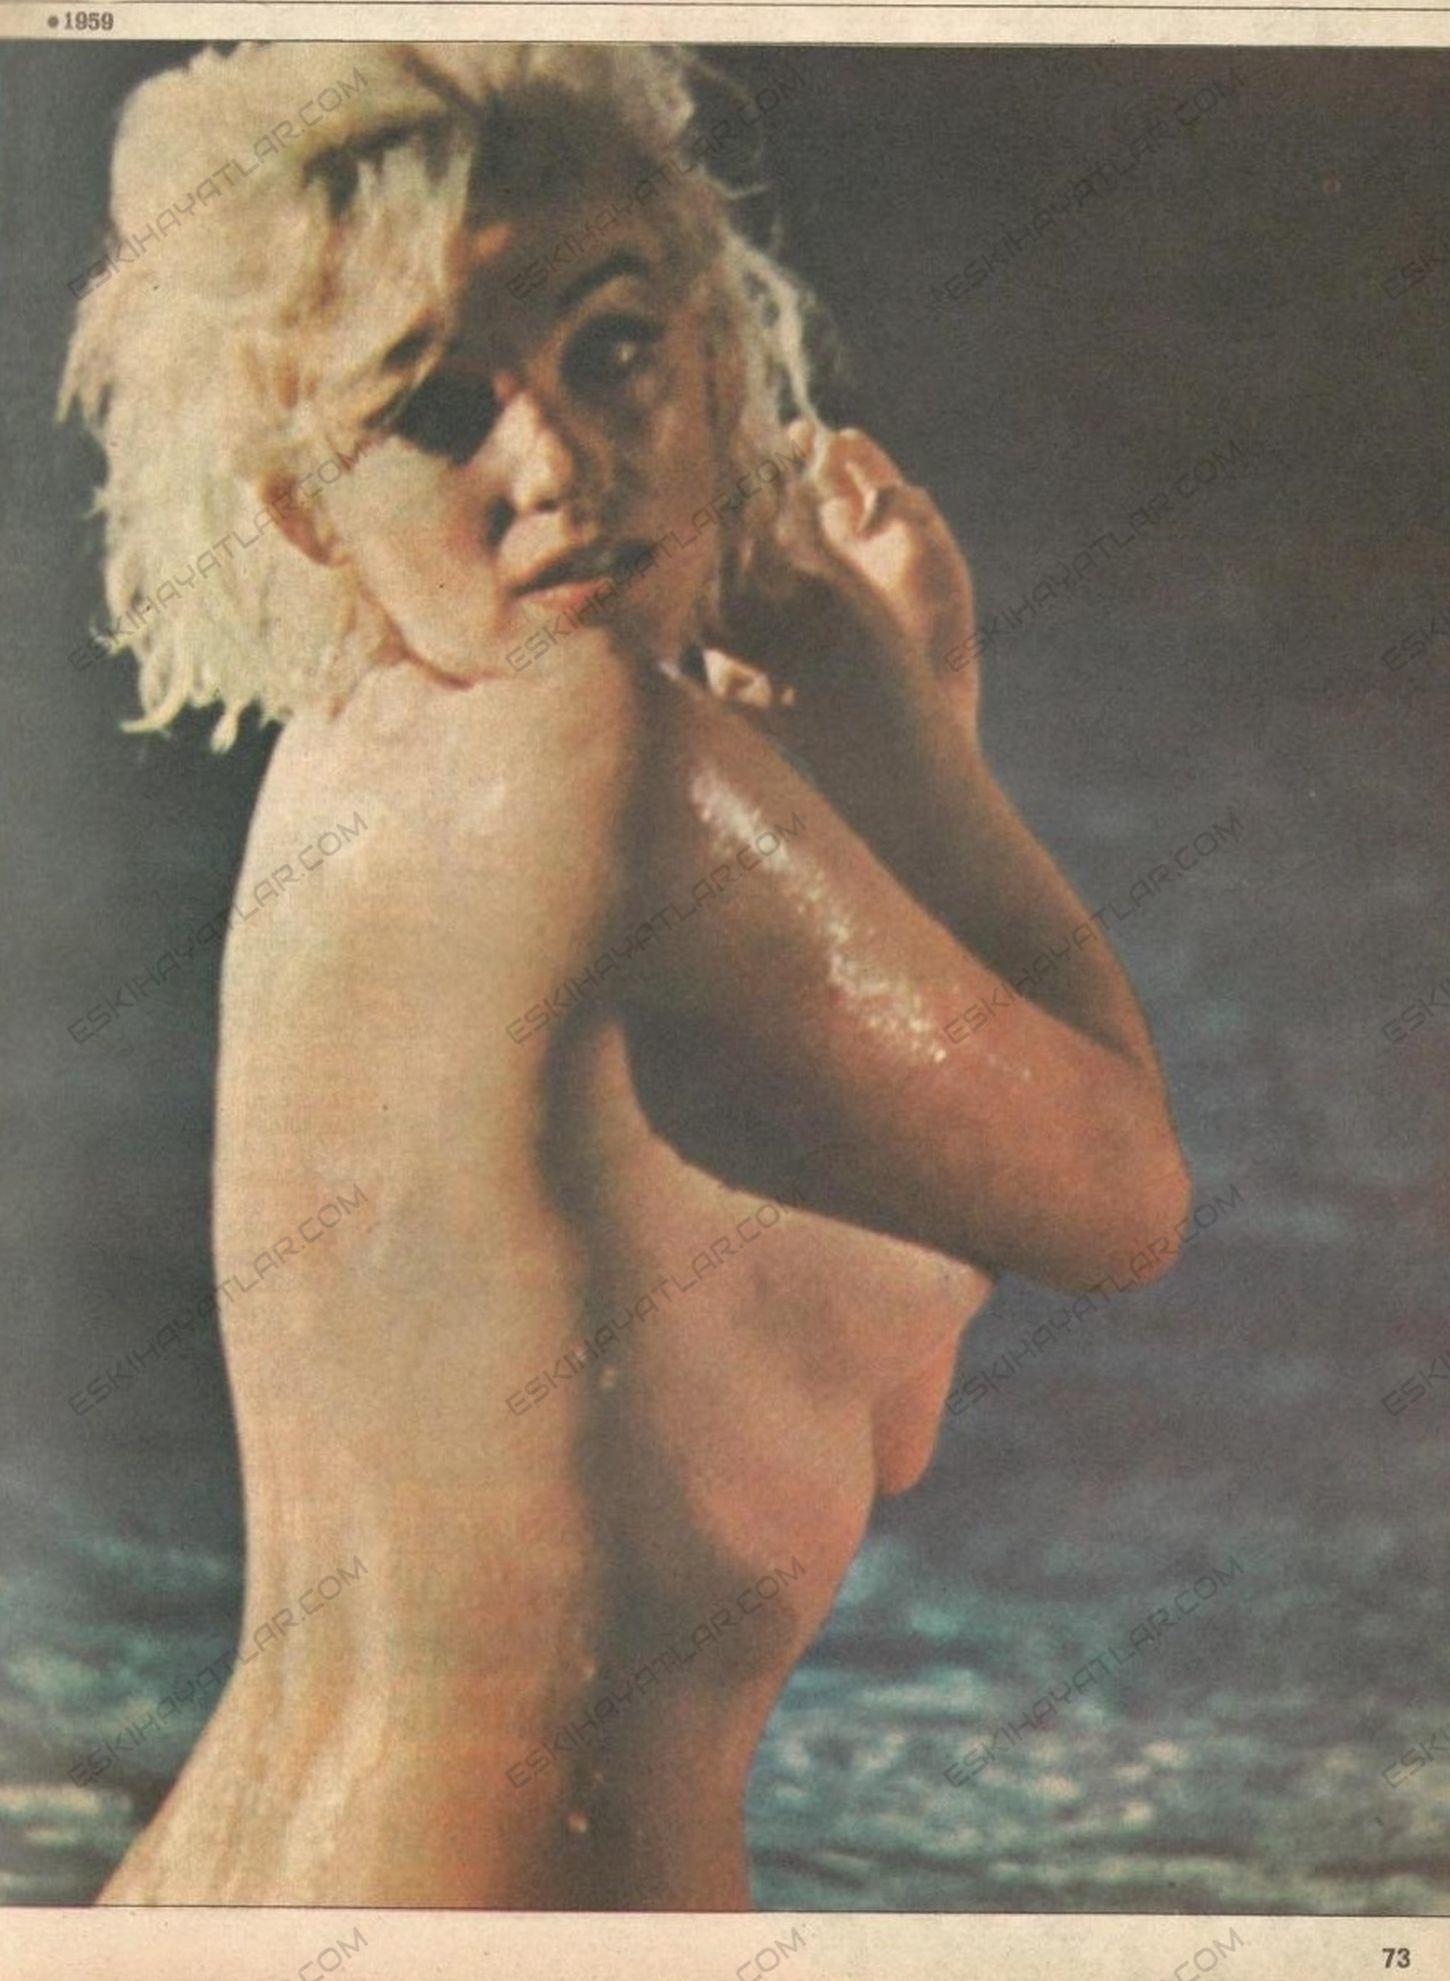 marilyn-monroe-fotograflari-erkekce-dergisi-arsivleri (7)